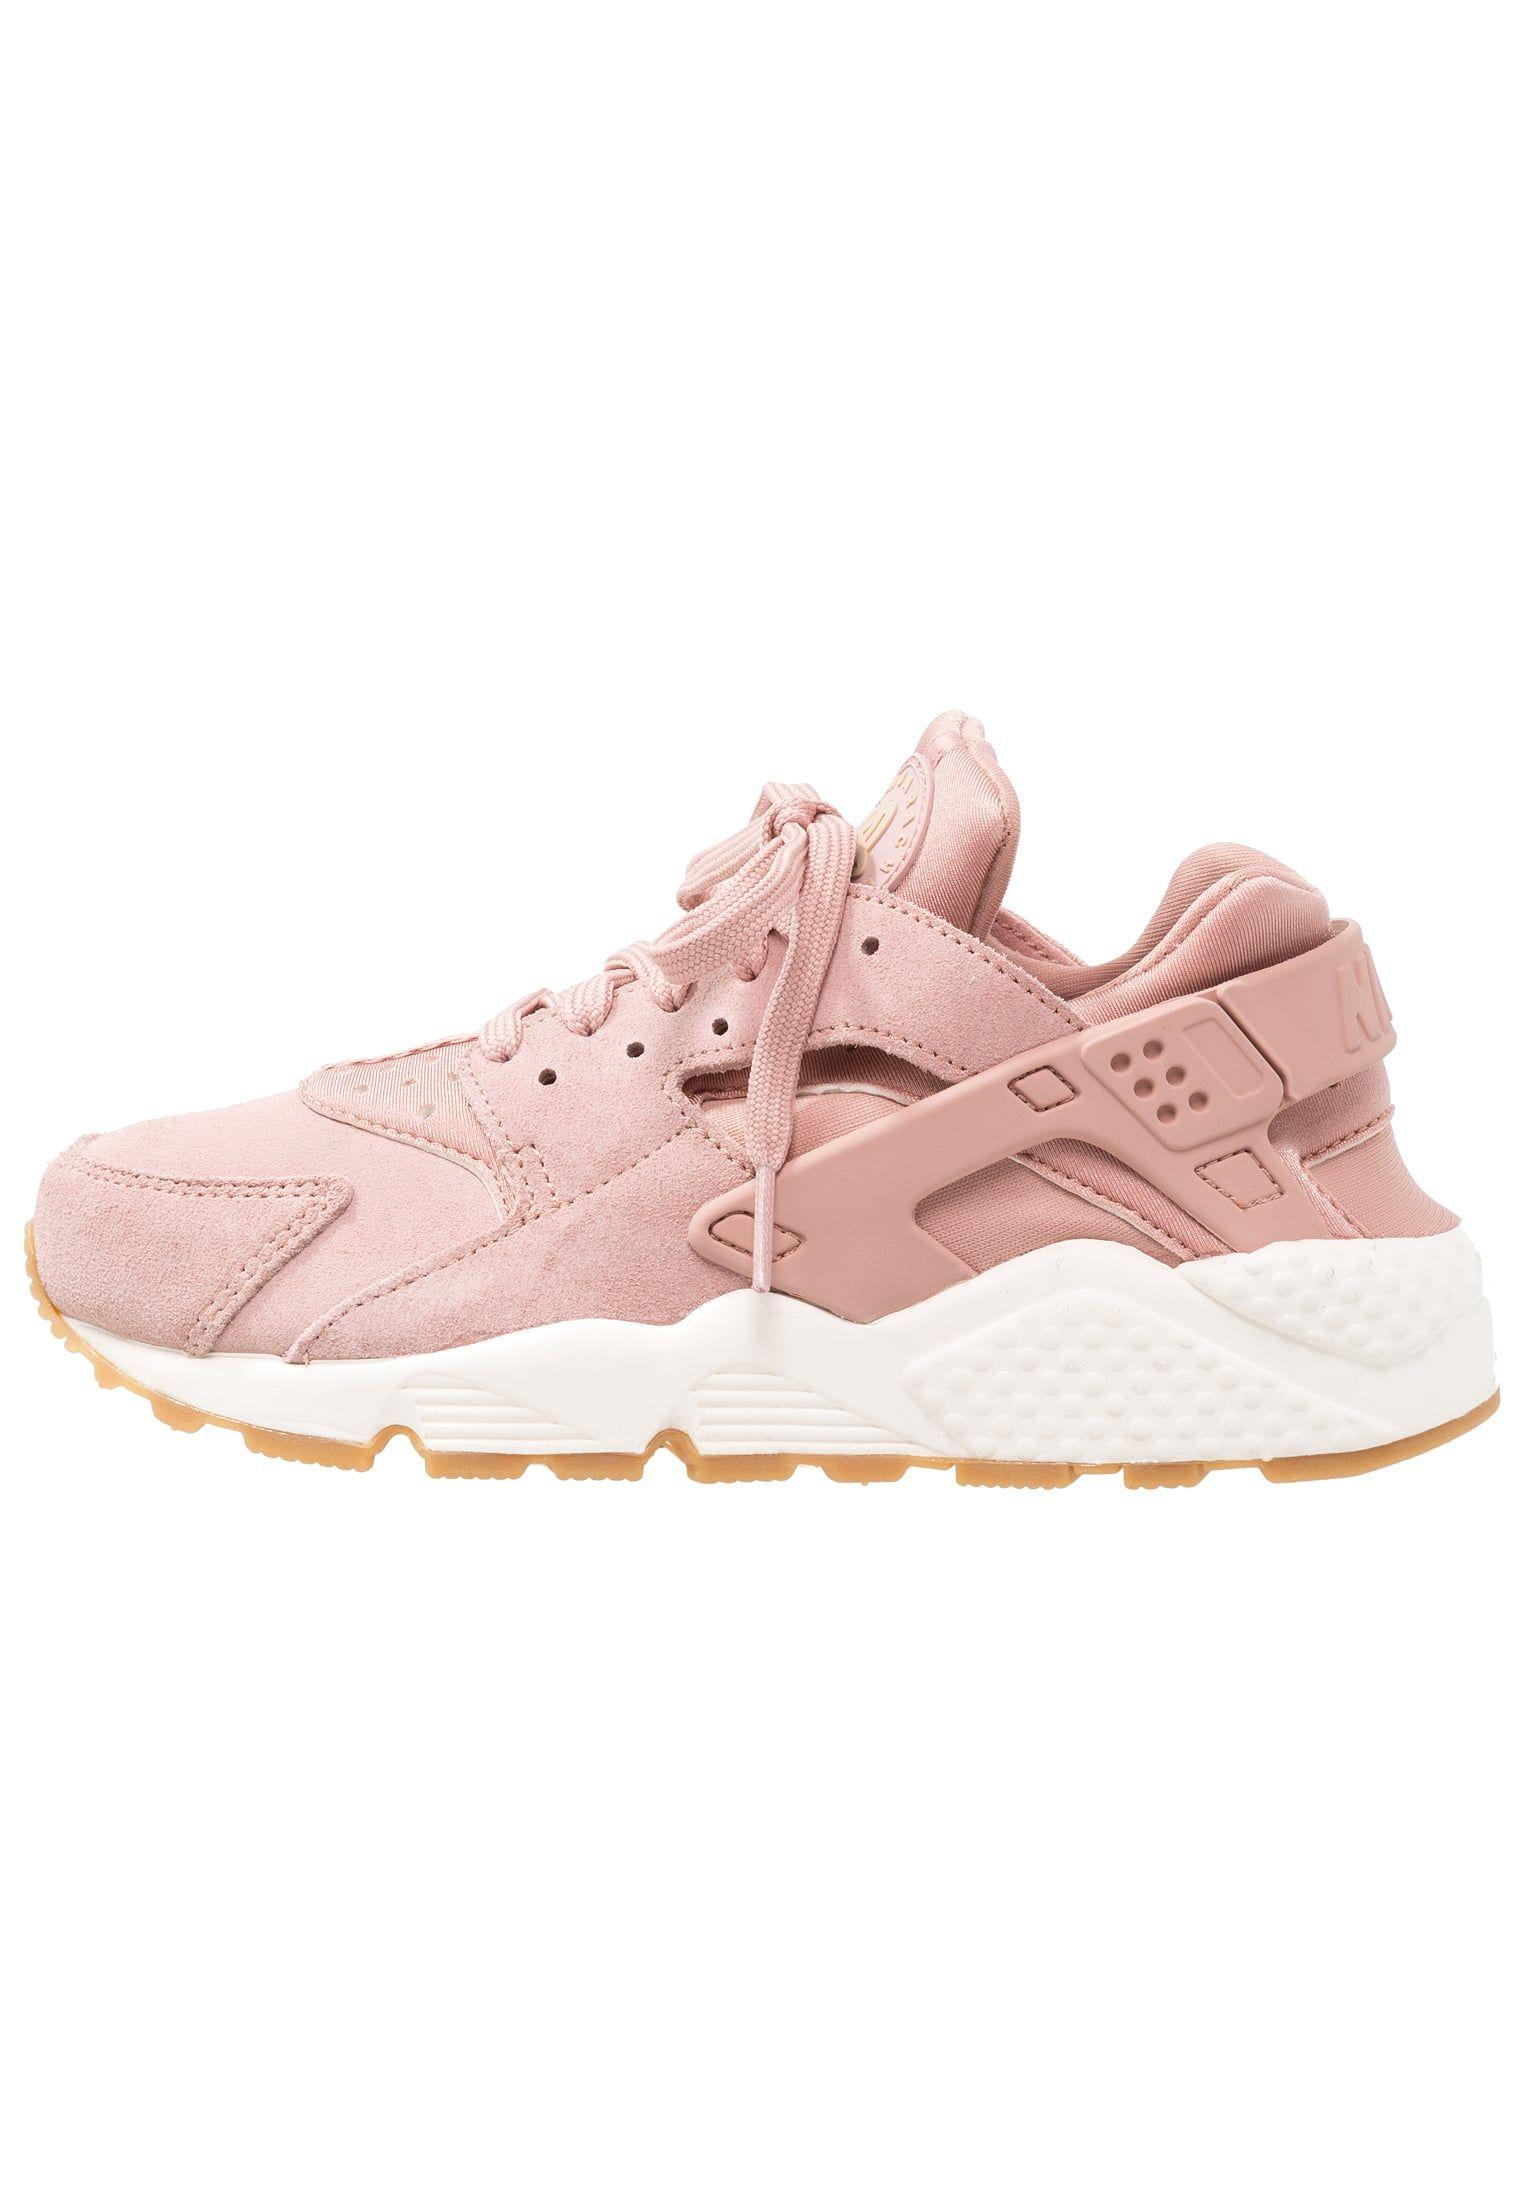 b0d0e2cc1b20c greece baby pink rose nike air huarache rosa nike huarache by jklcustoms  a9496 1612a